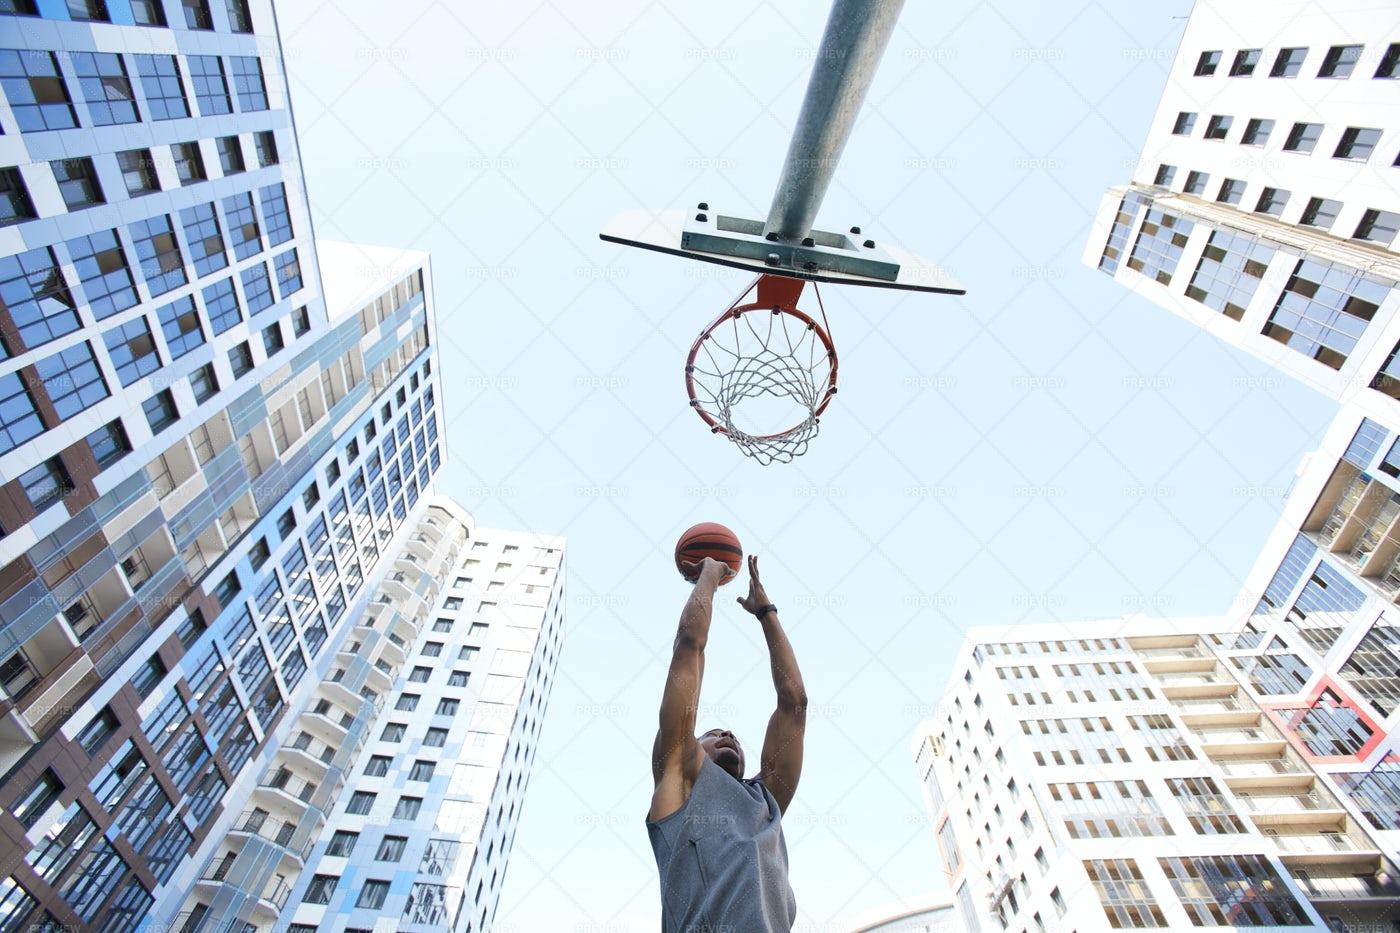 Basketball Background: Stock Photos